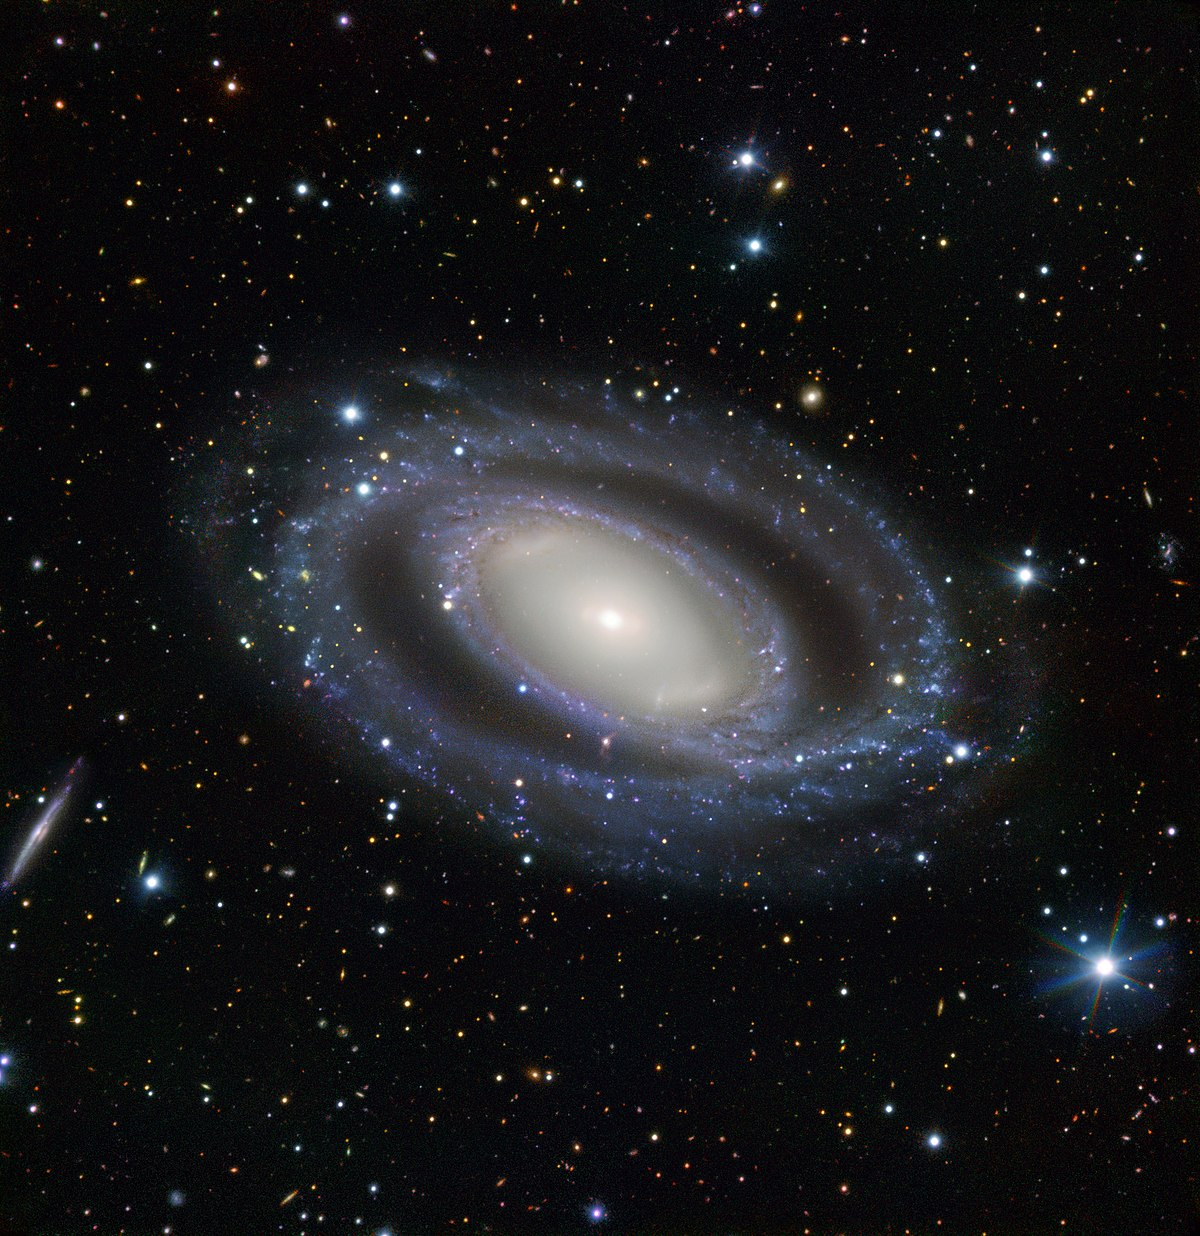 NGC 7098 - Wikipedia - 350.1KB